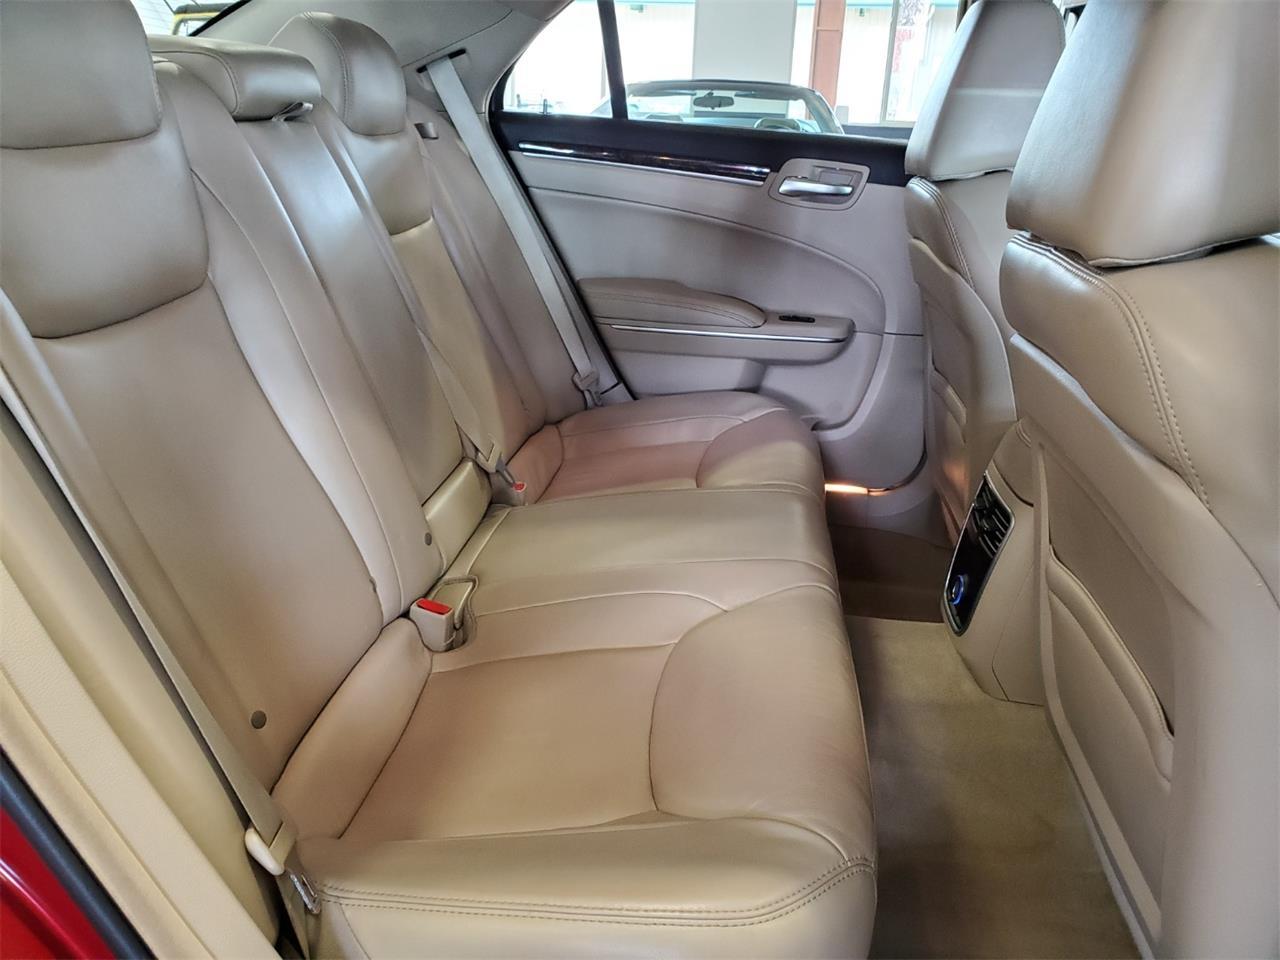 2012 Chrysler 300 (CC-1420328) for sale in Bend, Oregon